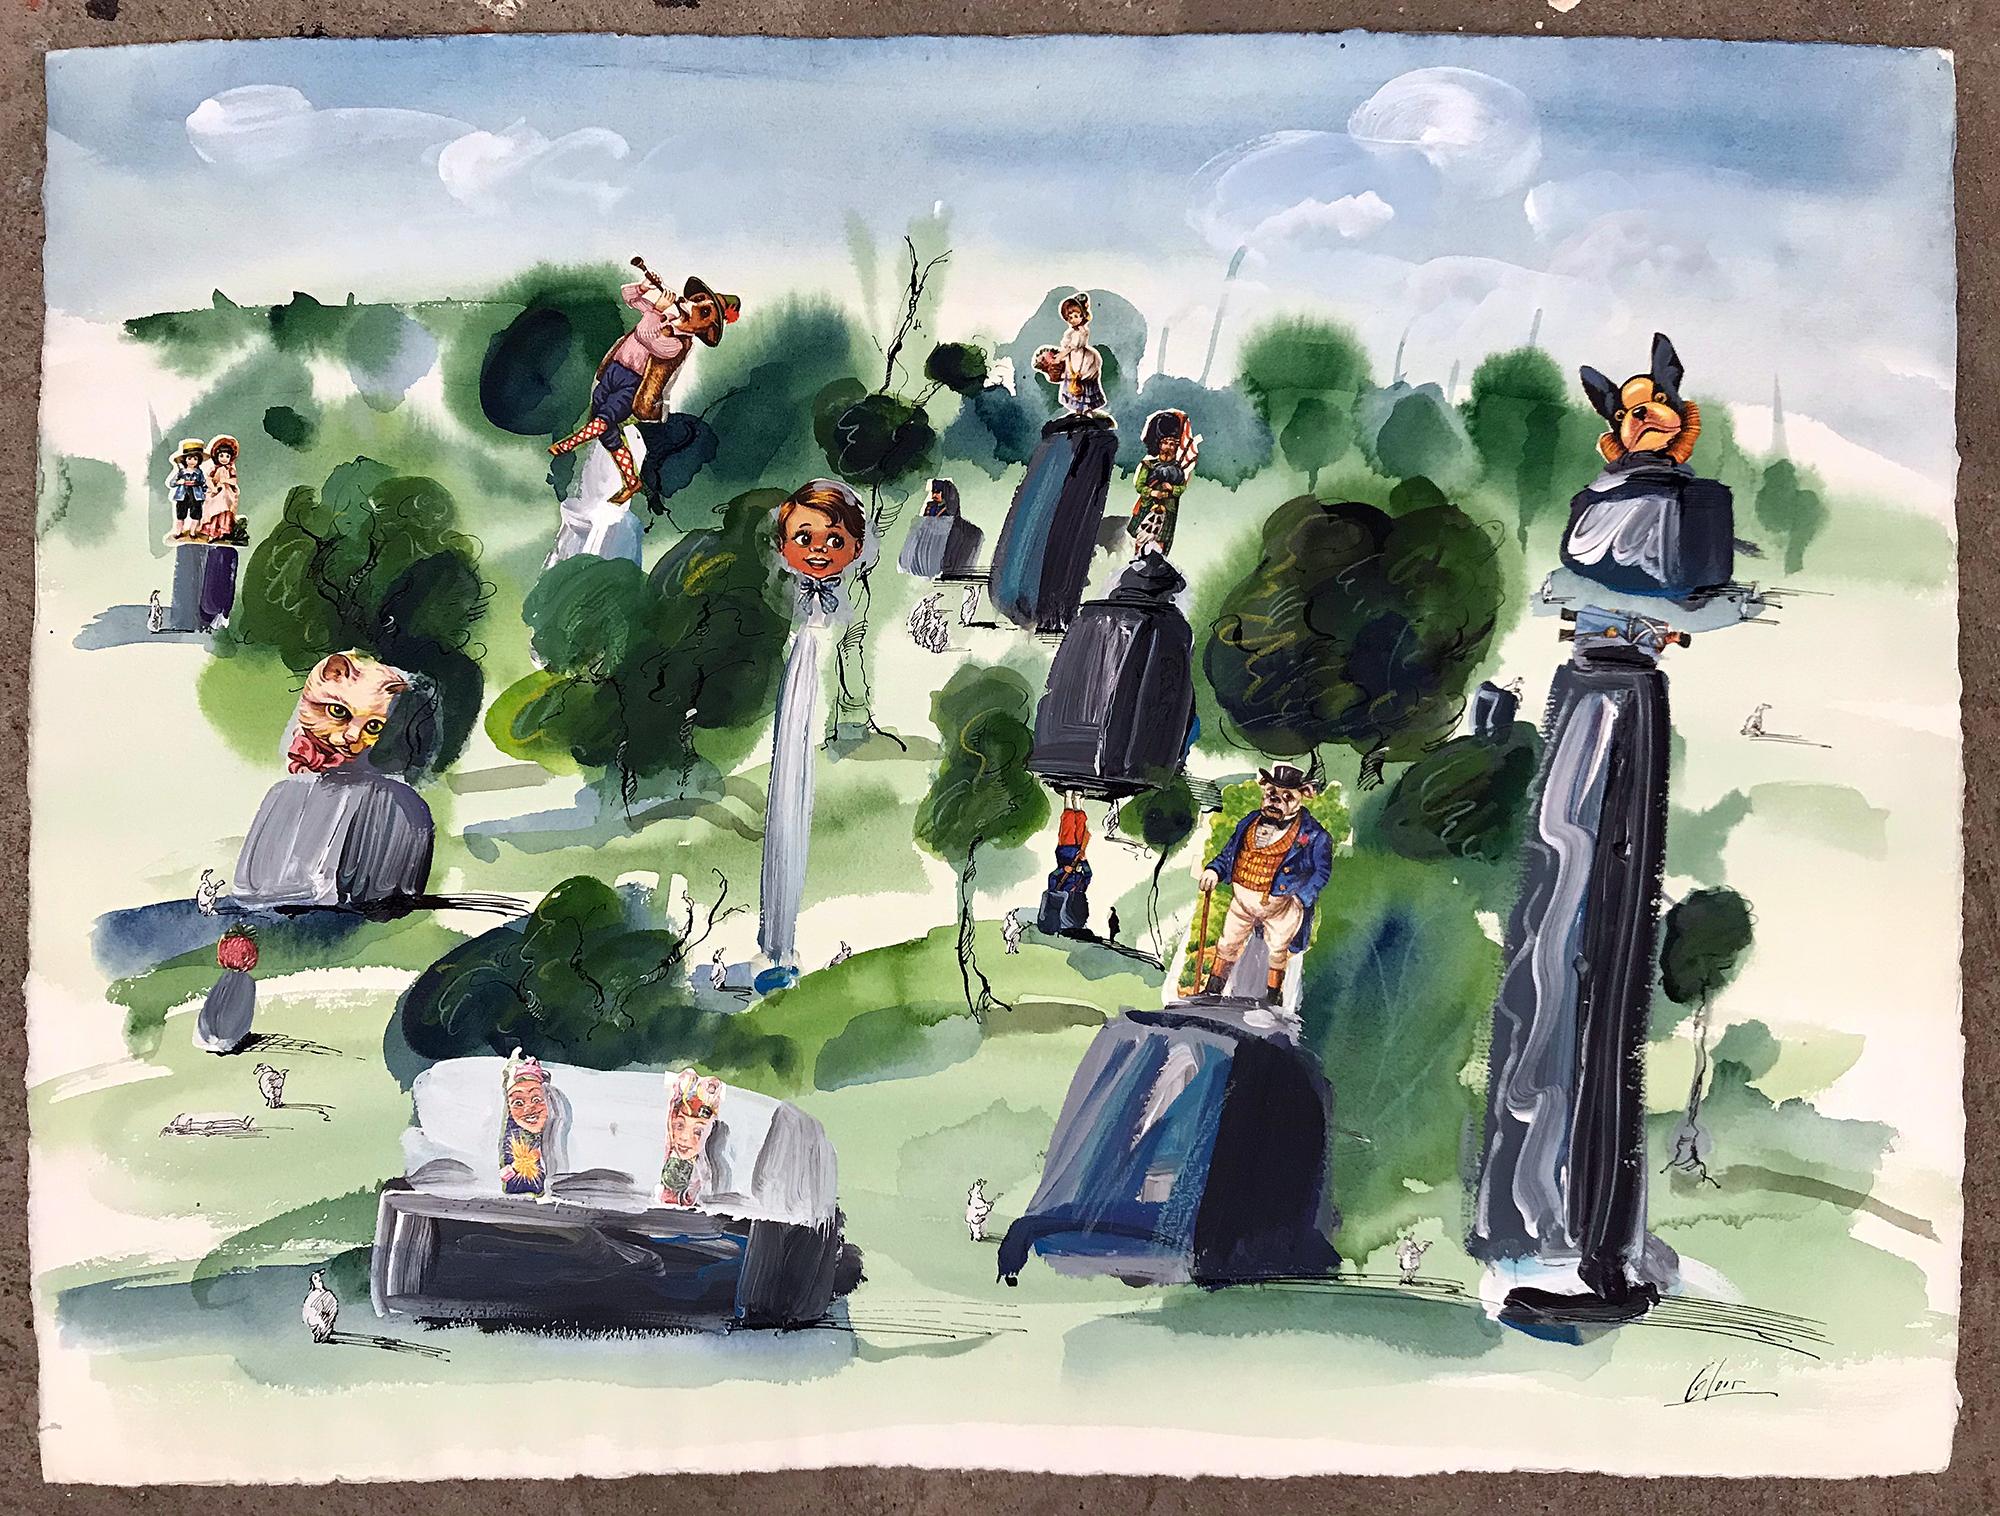 Denkmäler im Park, o.D., Mischtechnik auf Büttenpapier, 54 x 40 cm, ohne Rahmen